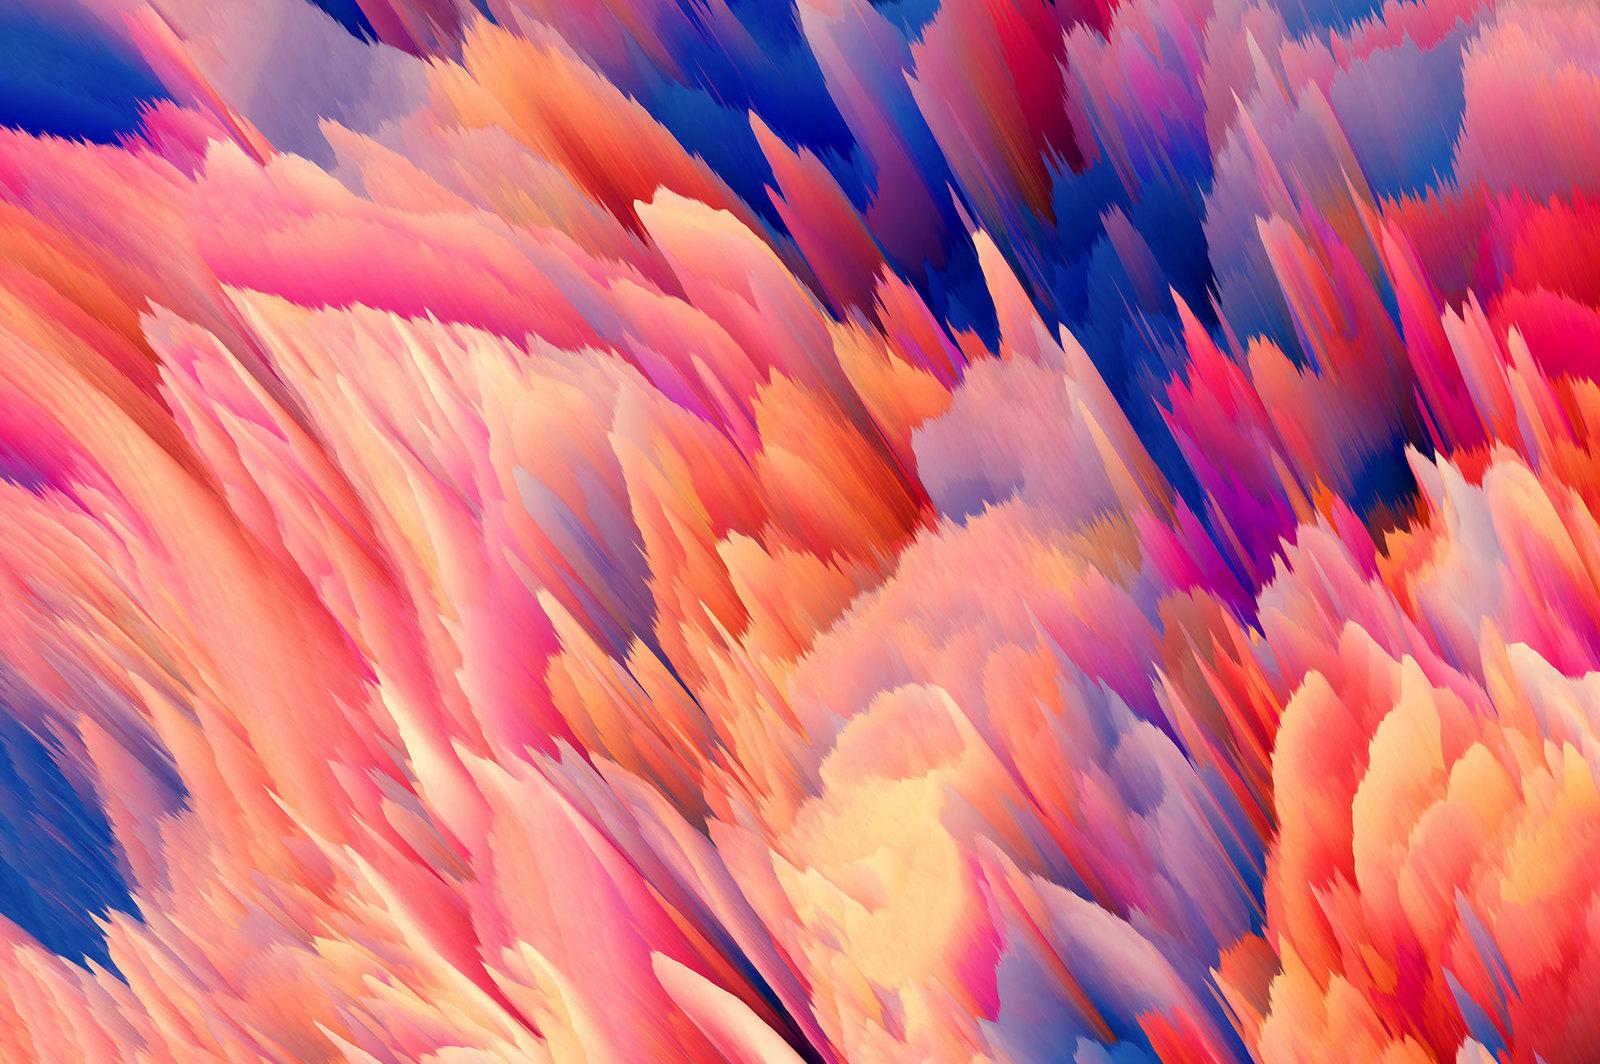 Vitality: 12 Dynamic 3D Textures